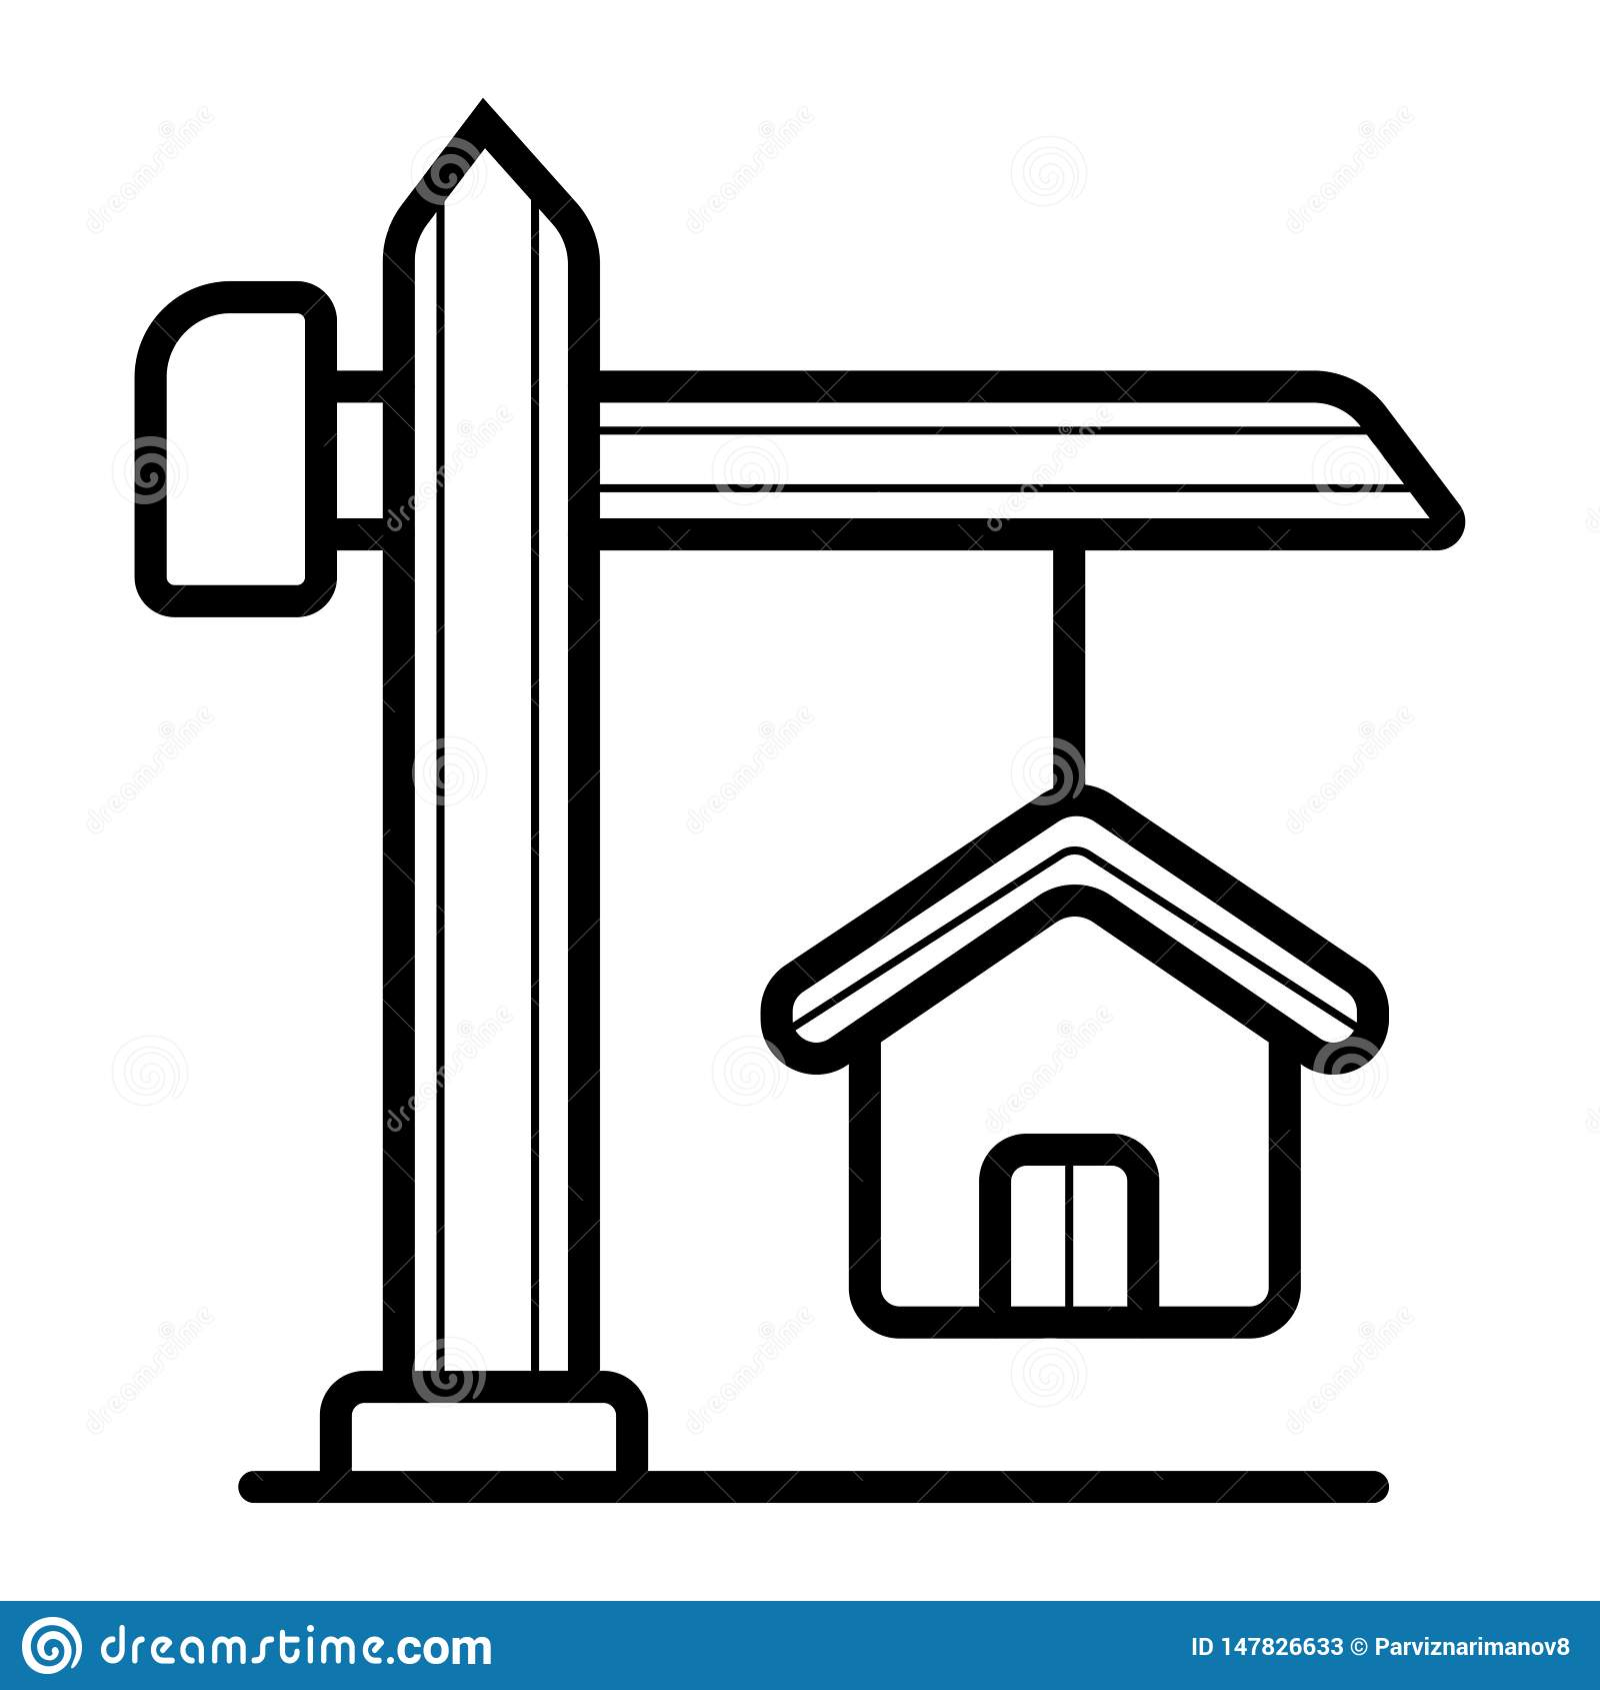 Real Estate ikona